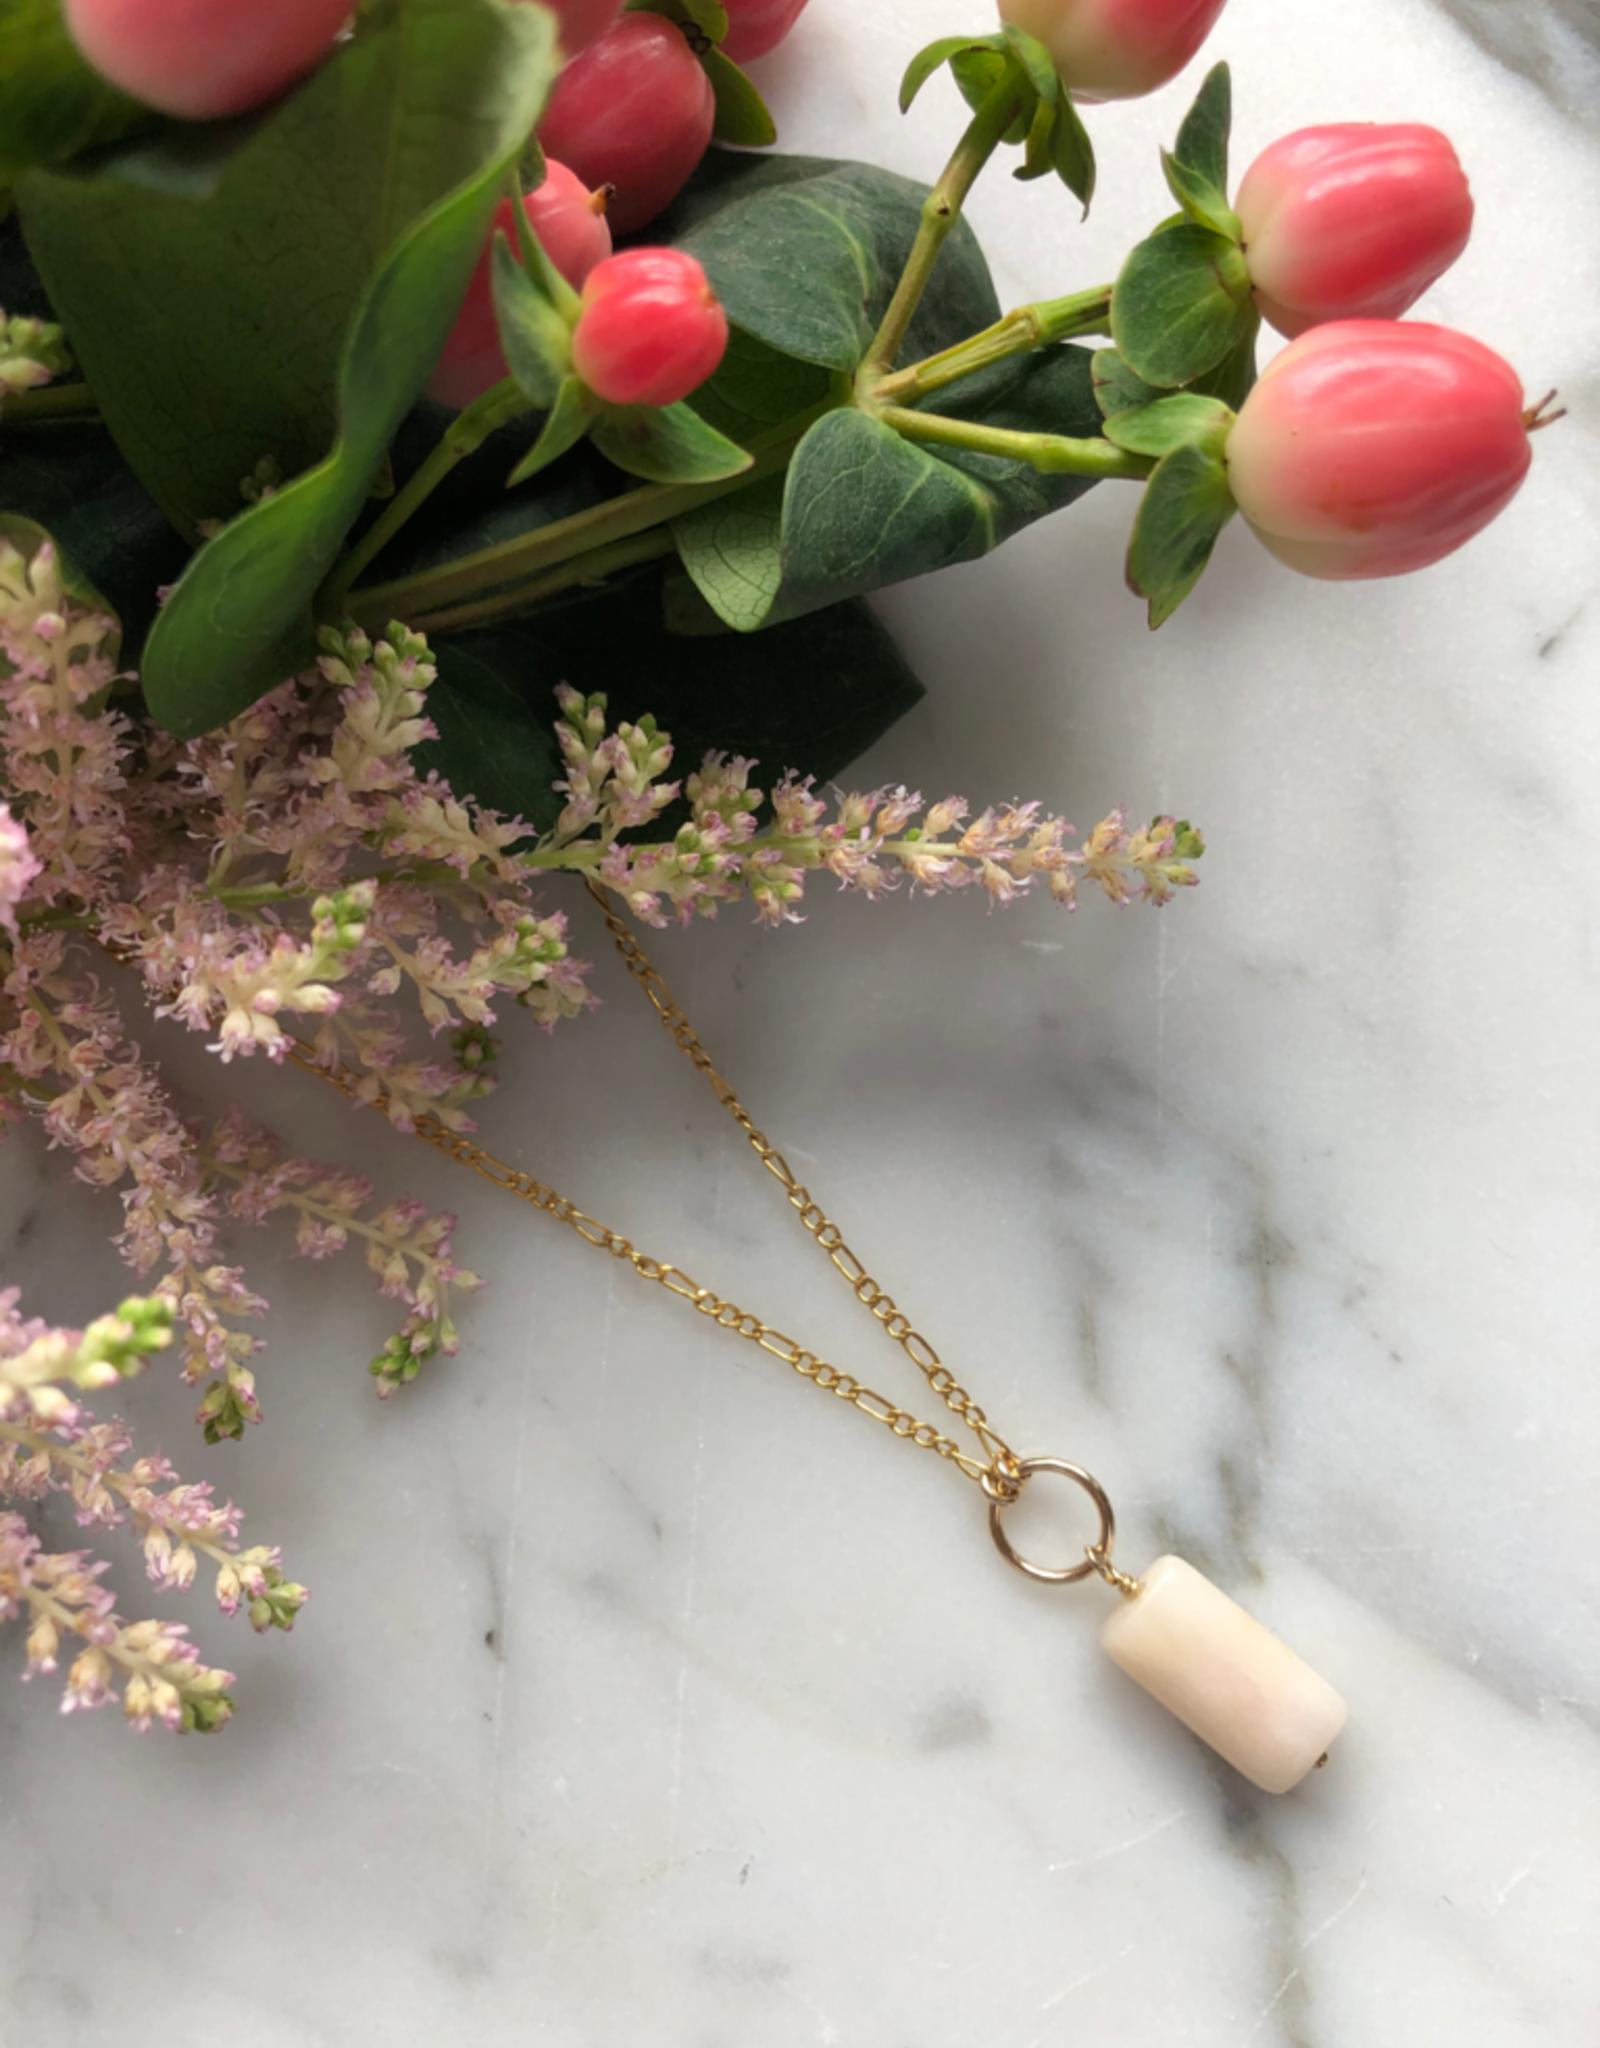 "Flora Ciccarelli Collier 20"" - Chaîne figaro, anneau et opale rose"